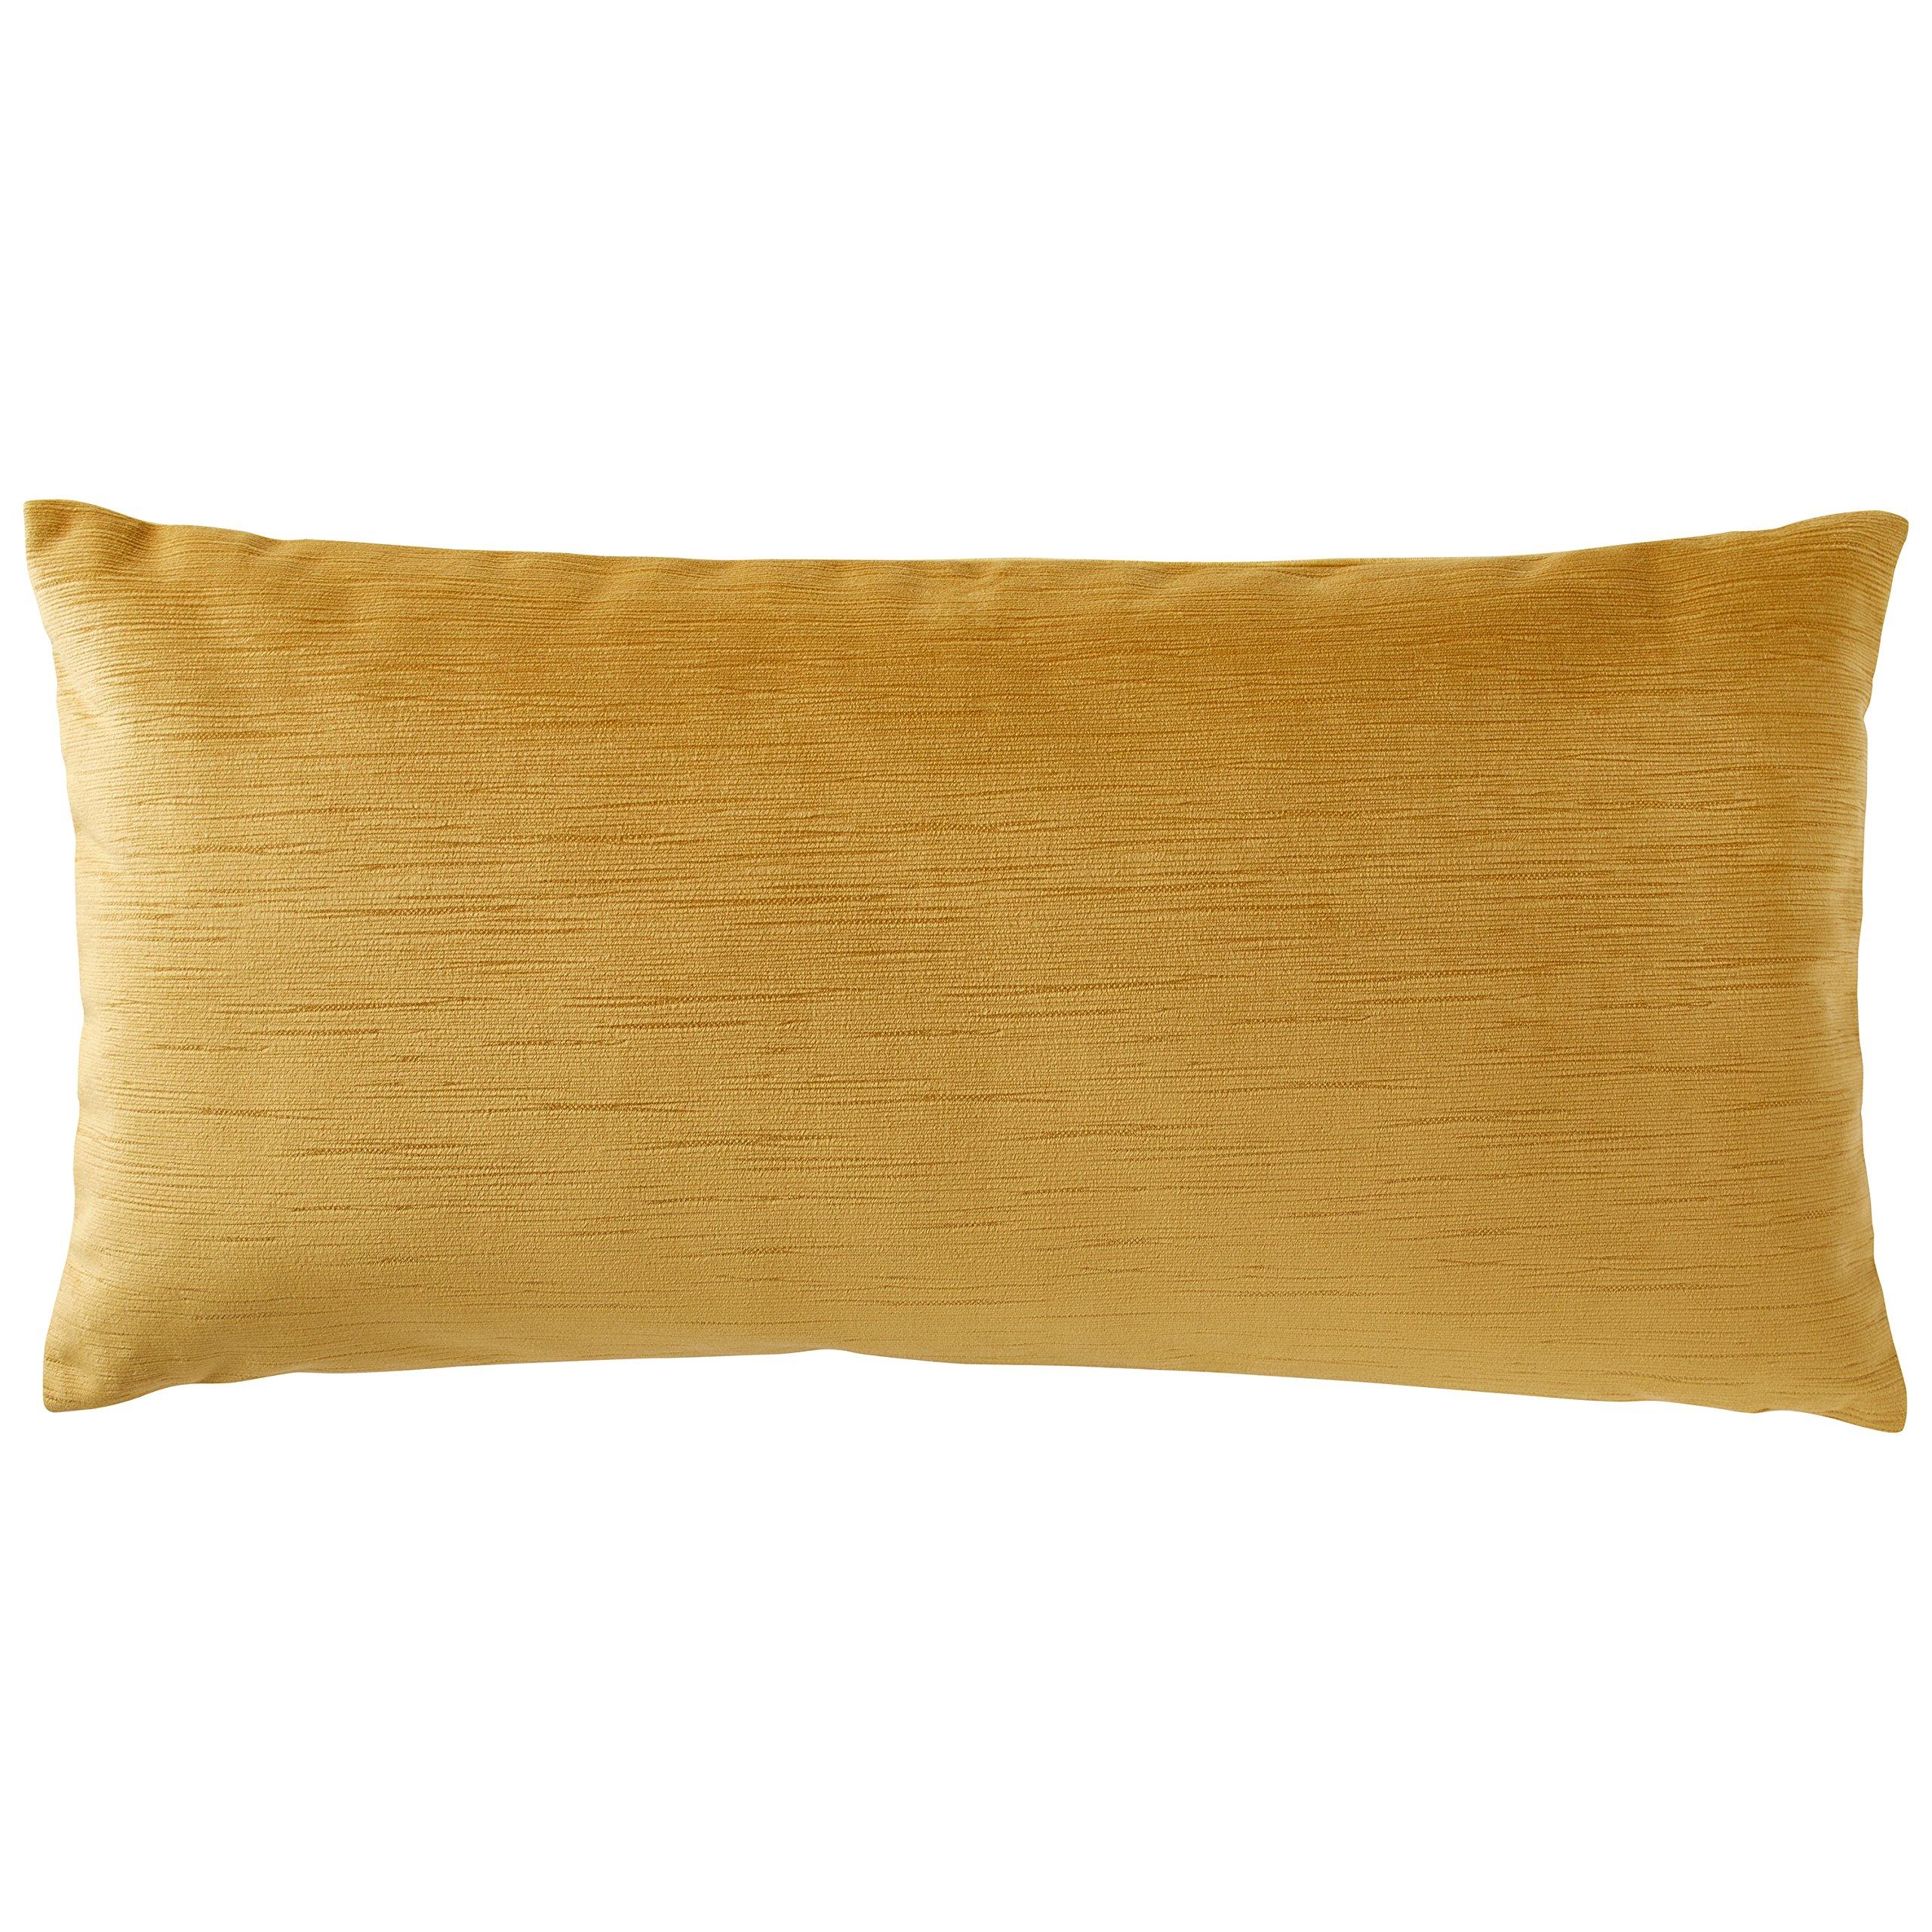 Rivet Velvet Texture Striated Pillow, 12'' x 24'', Honeycomb